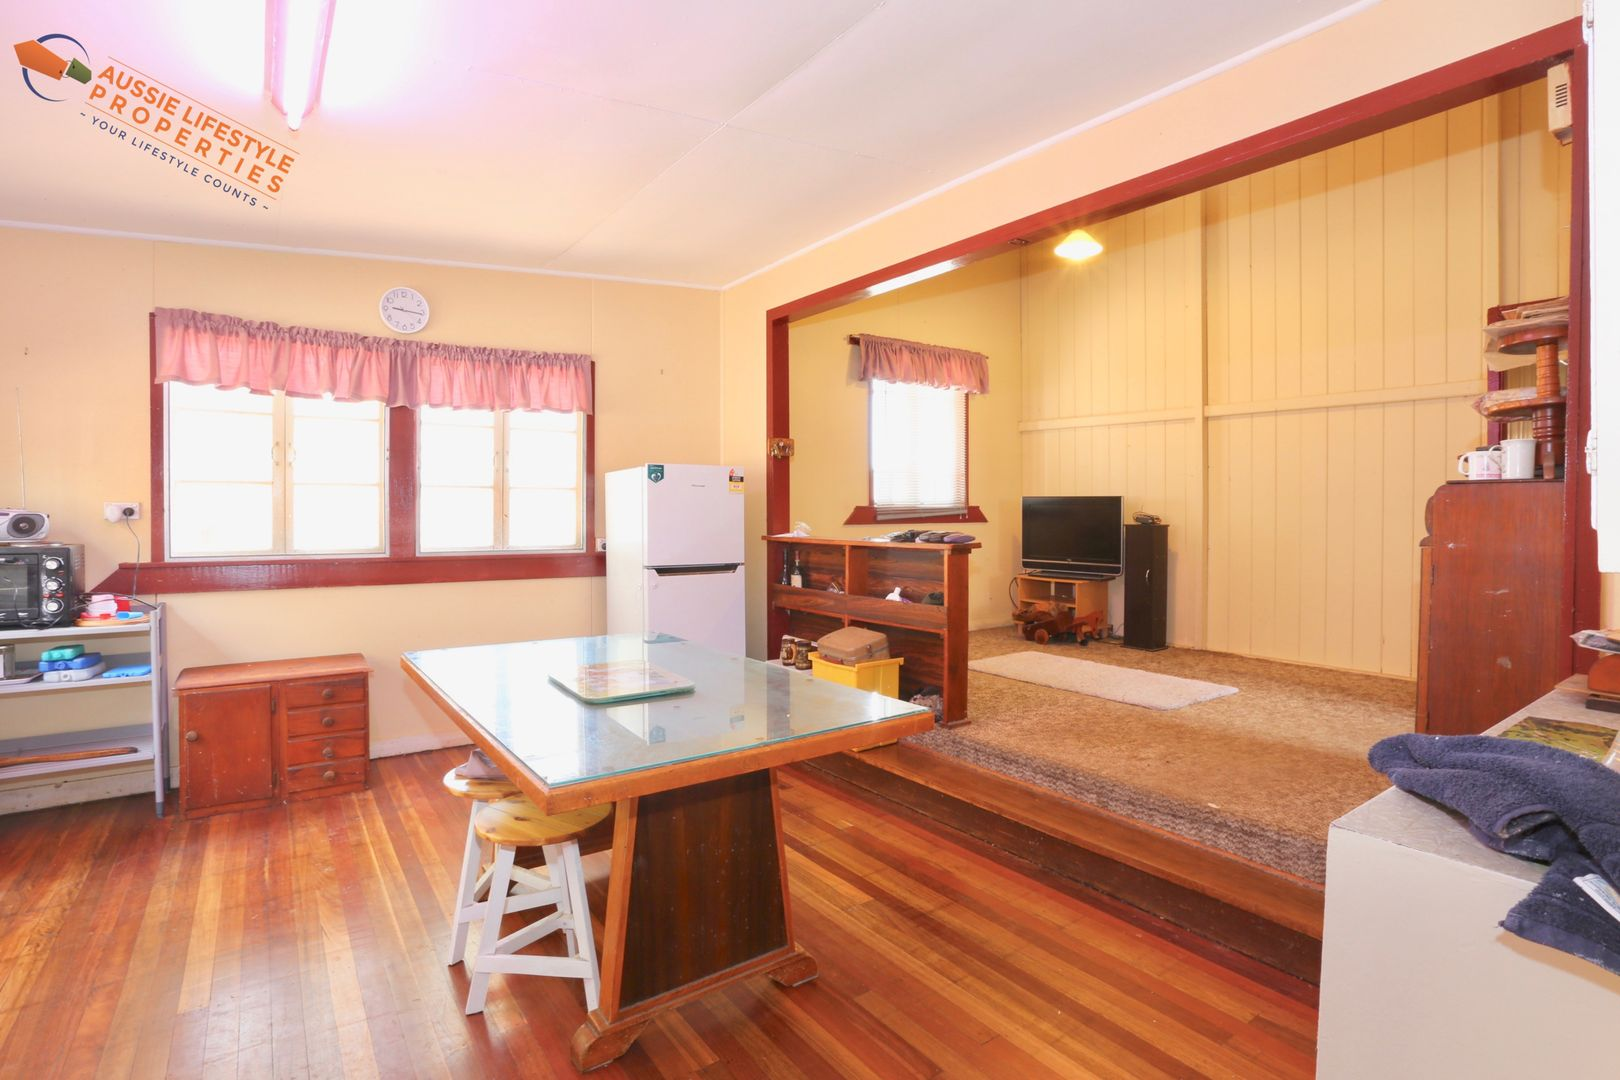 33-35 Appel Street, Canungra QLD 4275, Image 1